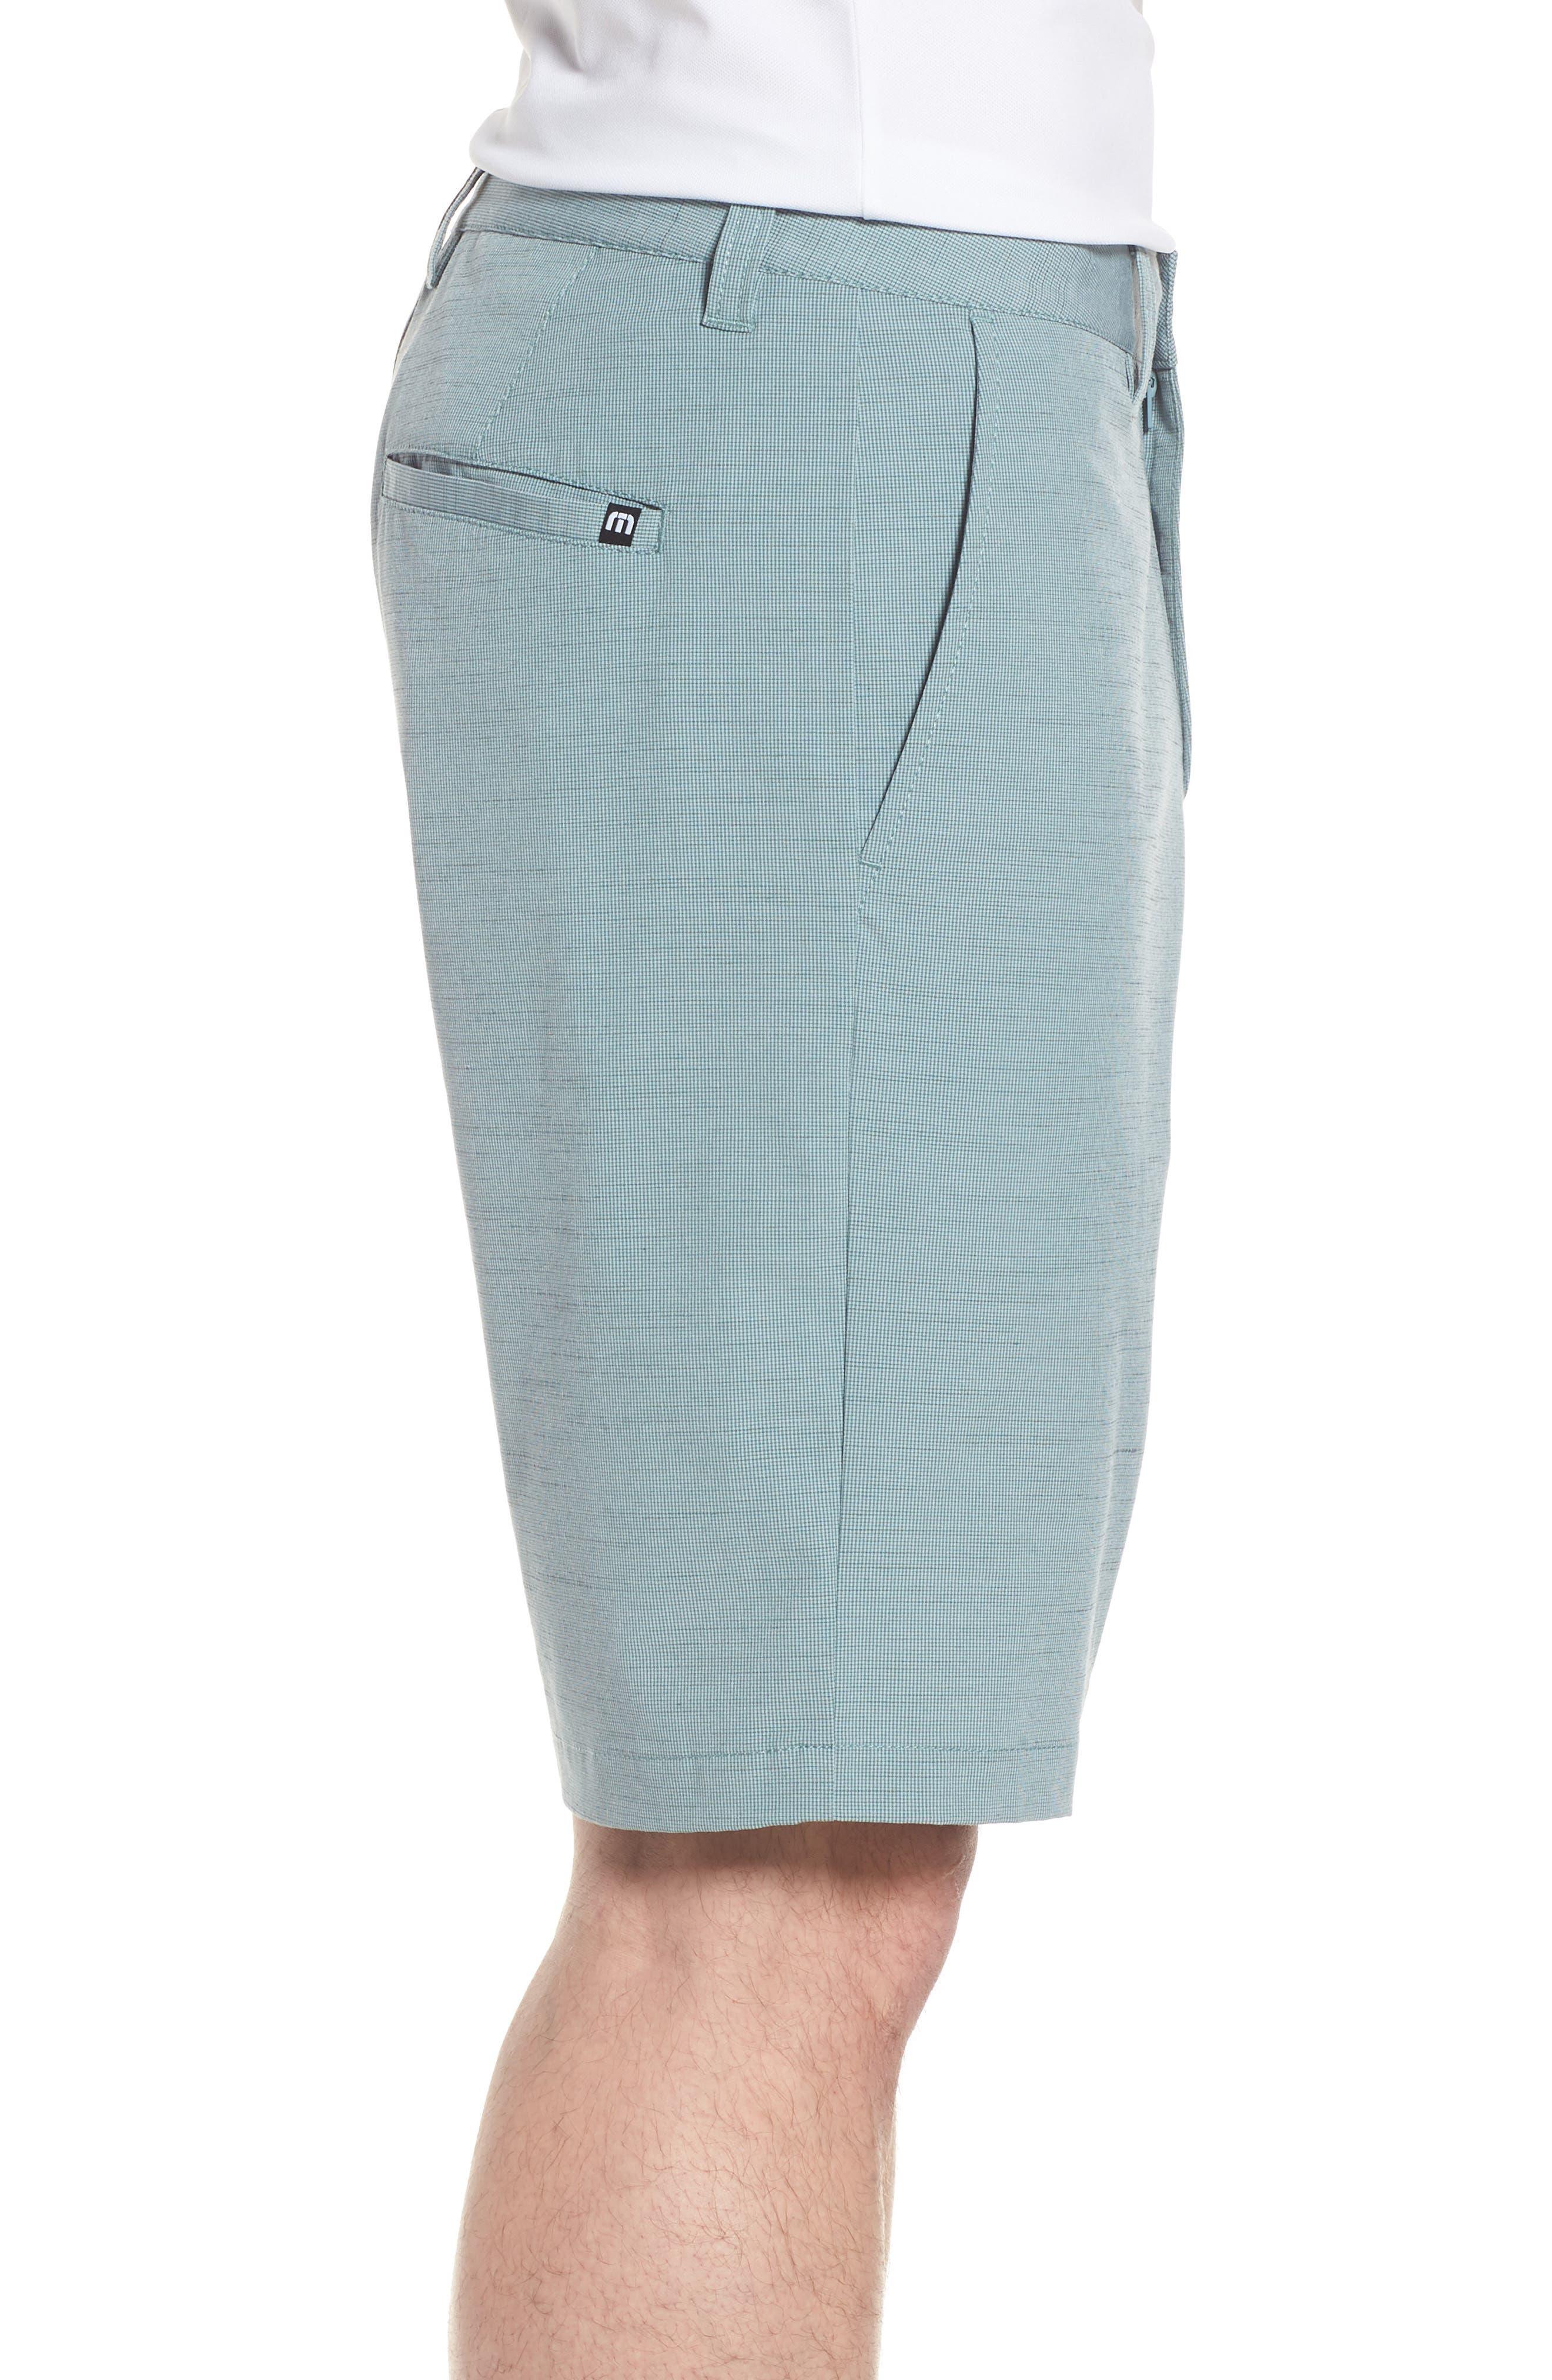 Tulum Stretch Shorts,                             Alternate thumbnail 3, color,                             300